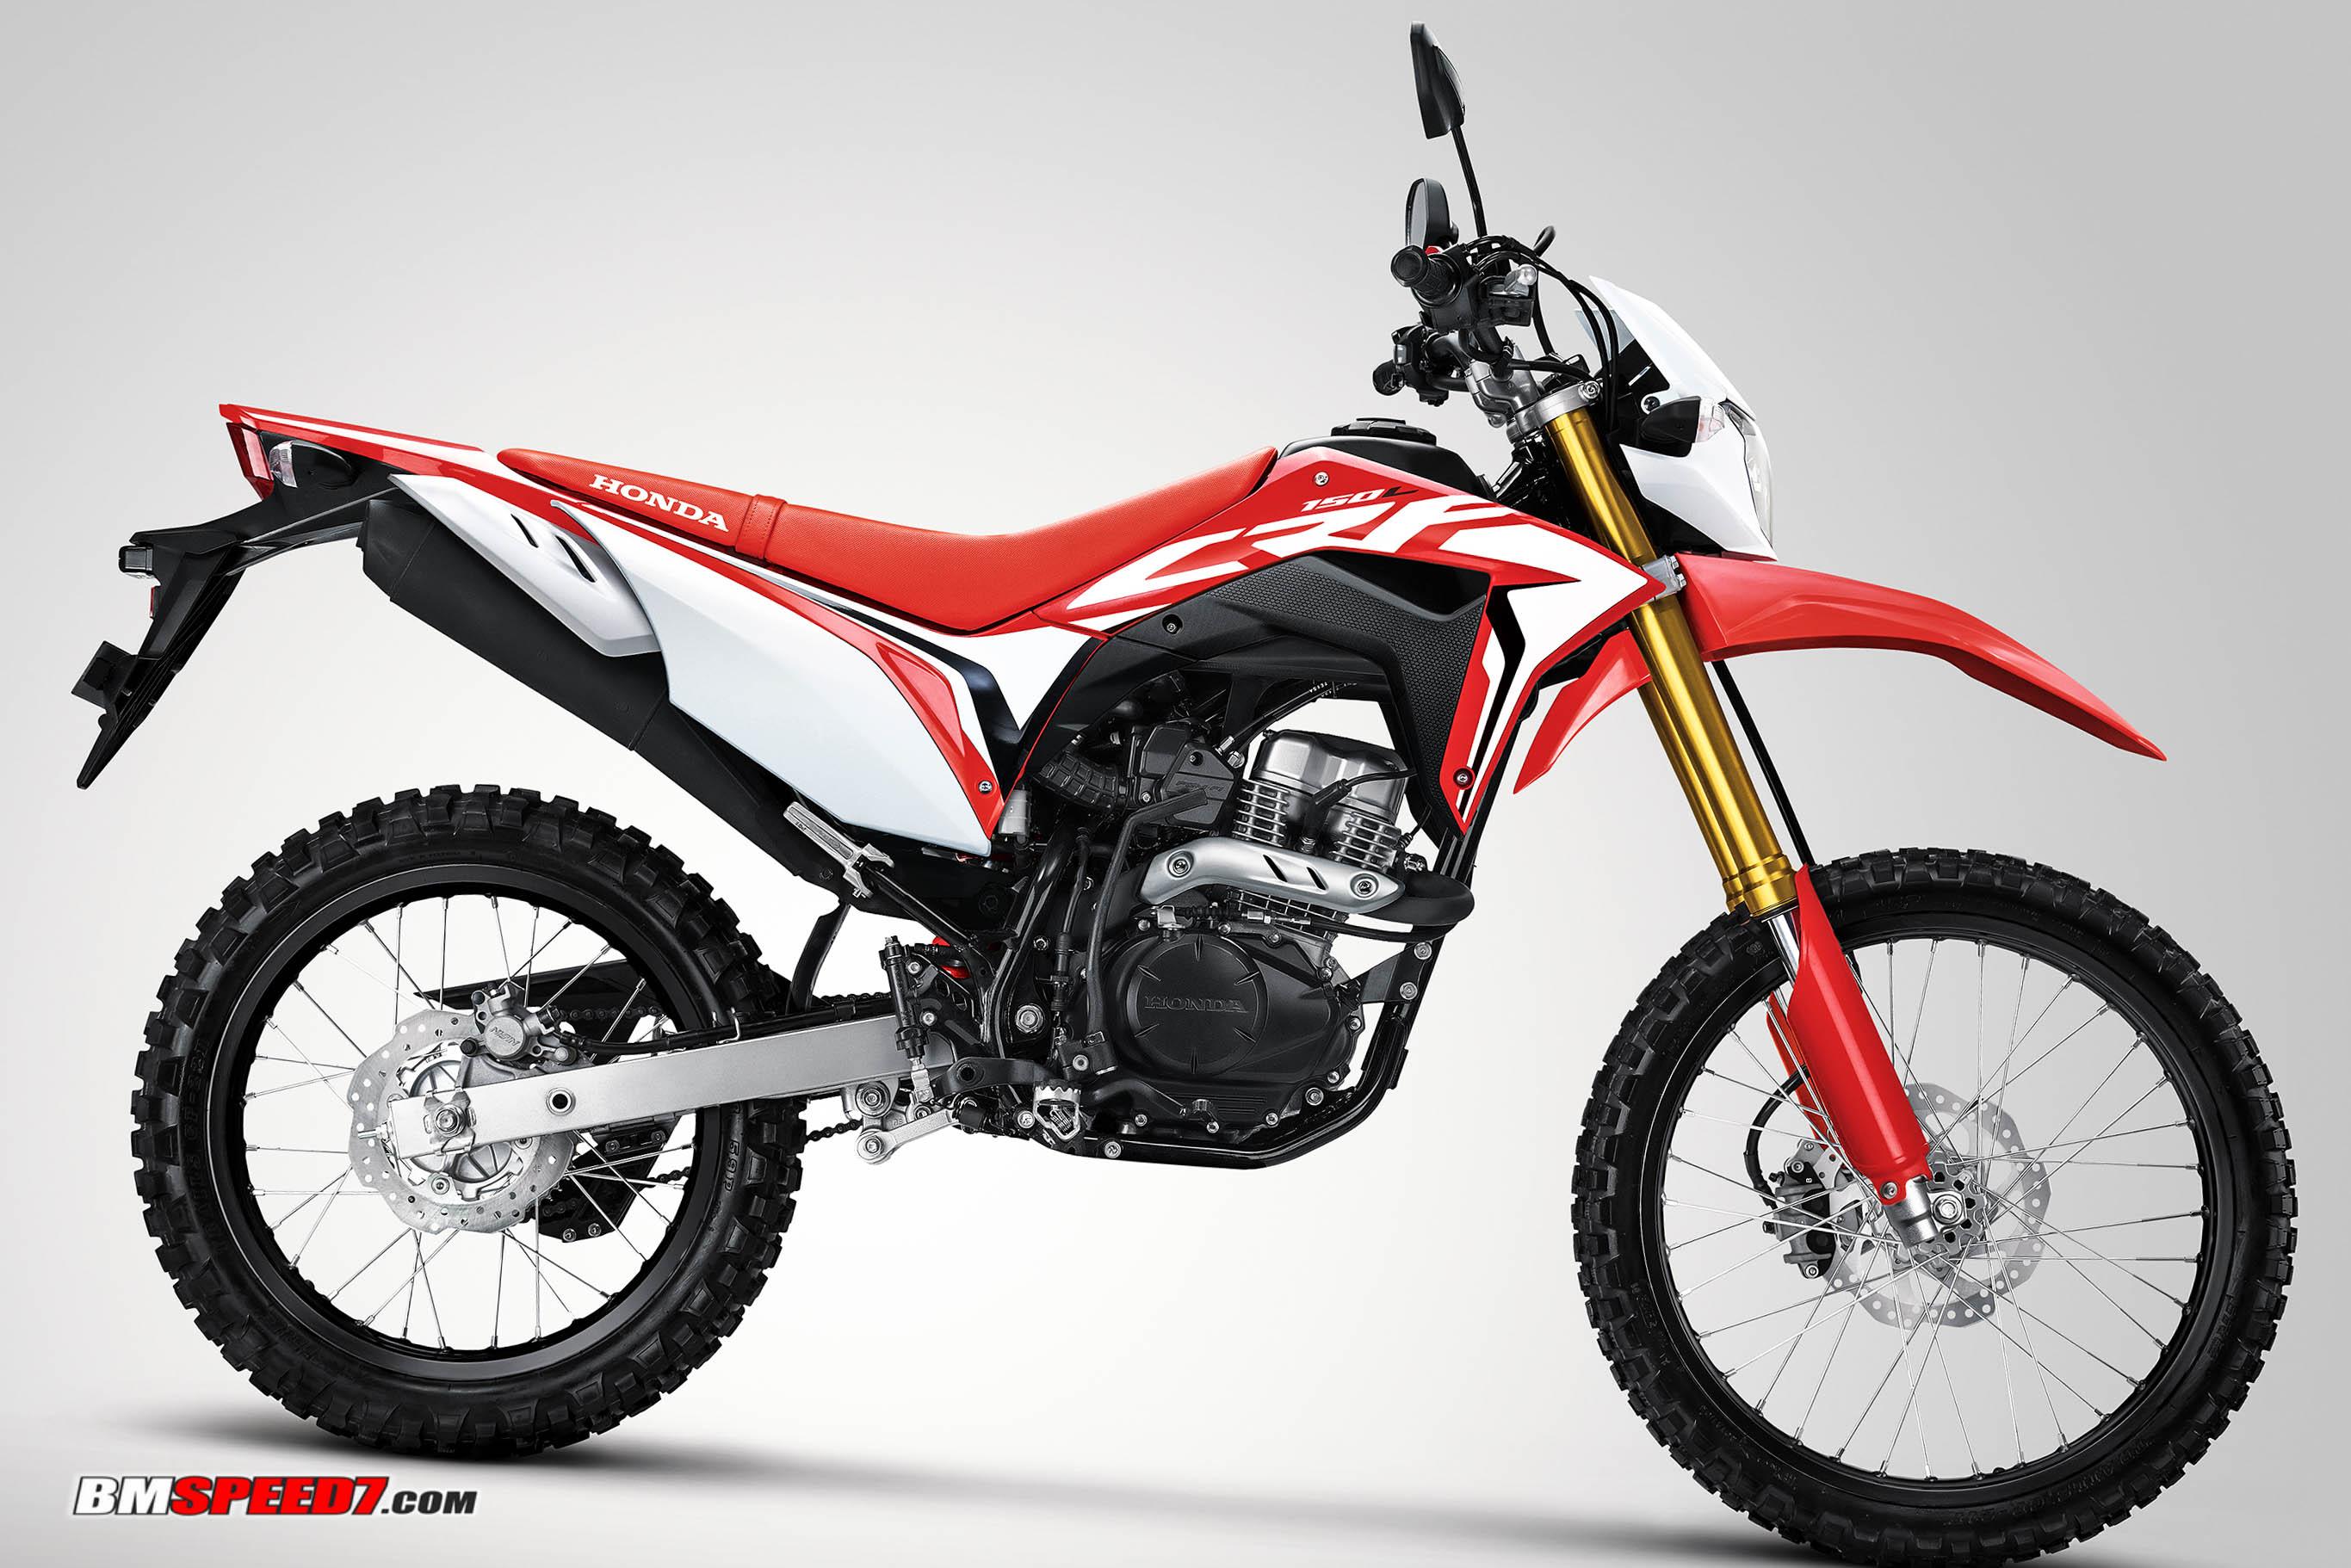 Pilihan Warna Honda Crf150l 2018 Harga Spesifikasi Dan